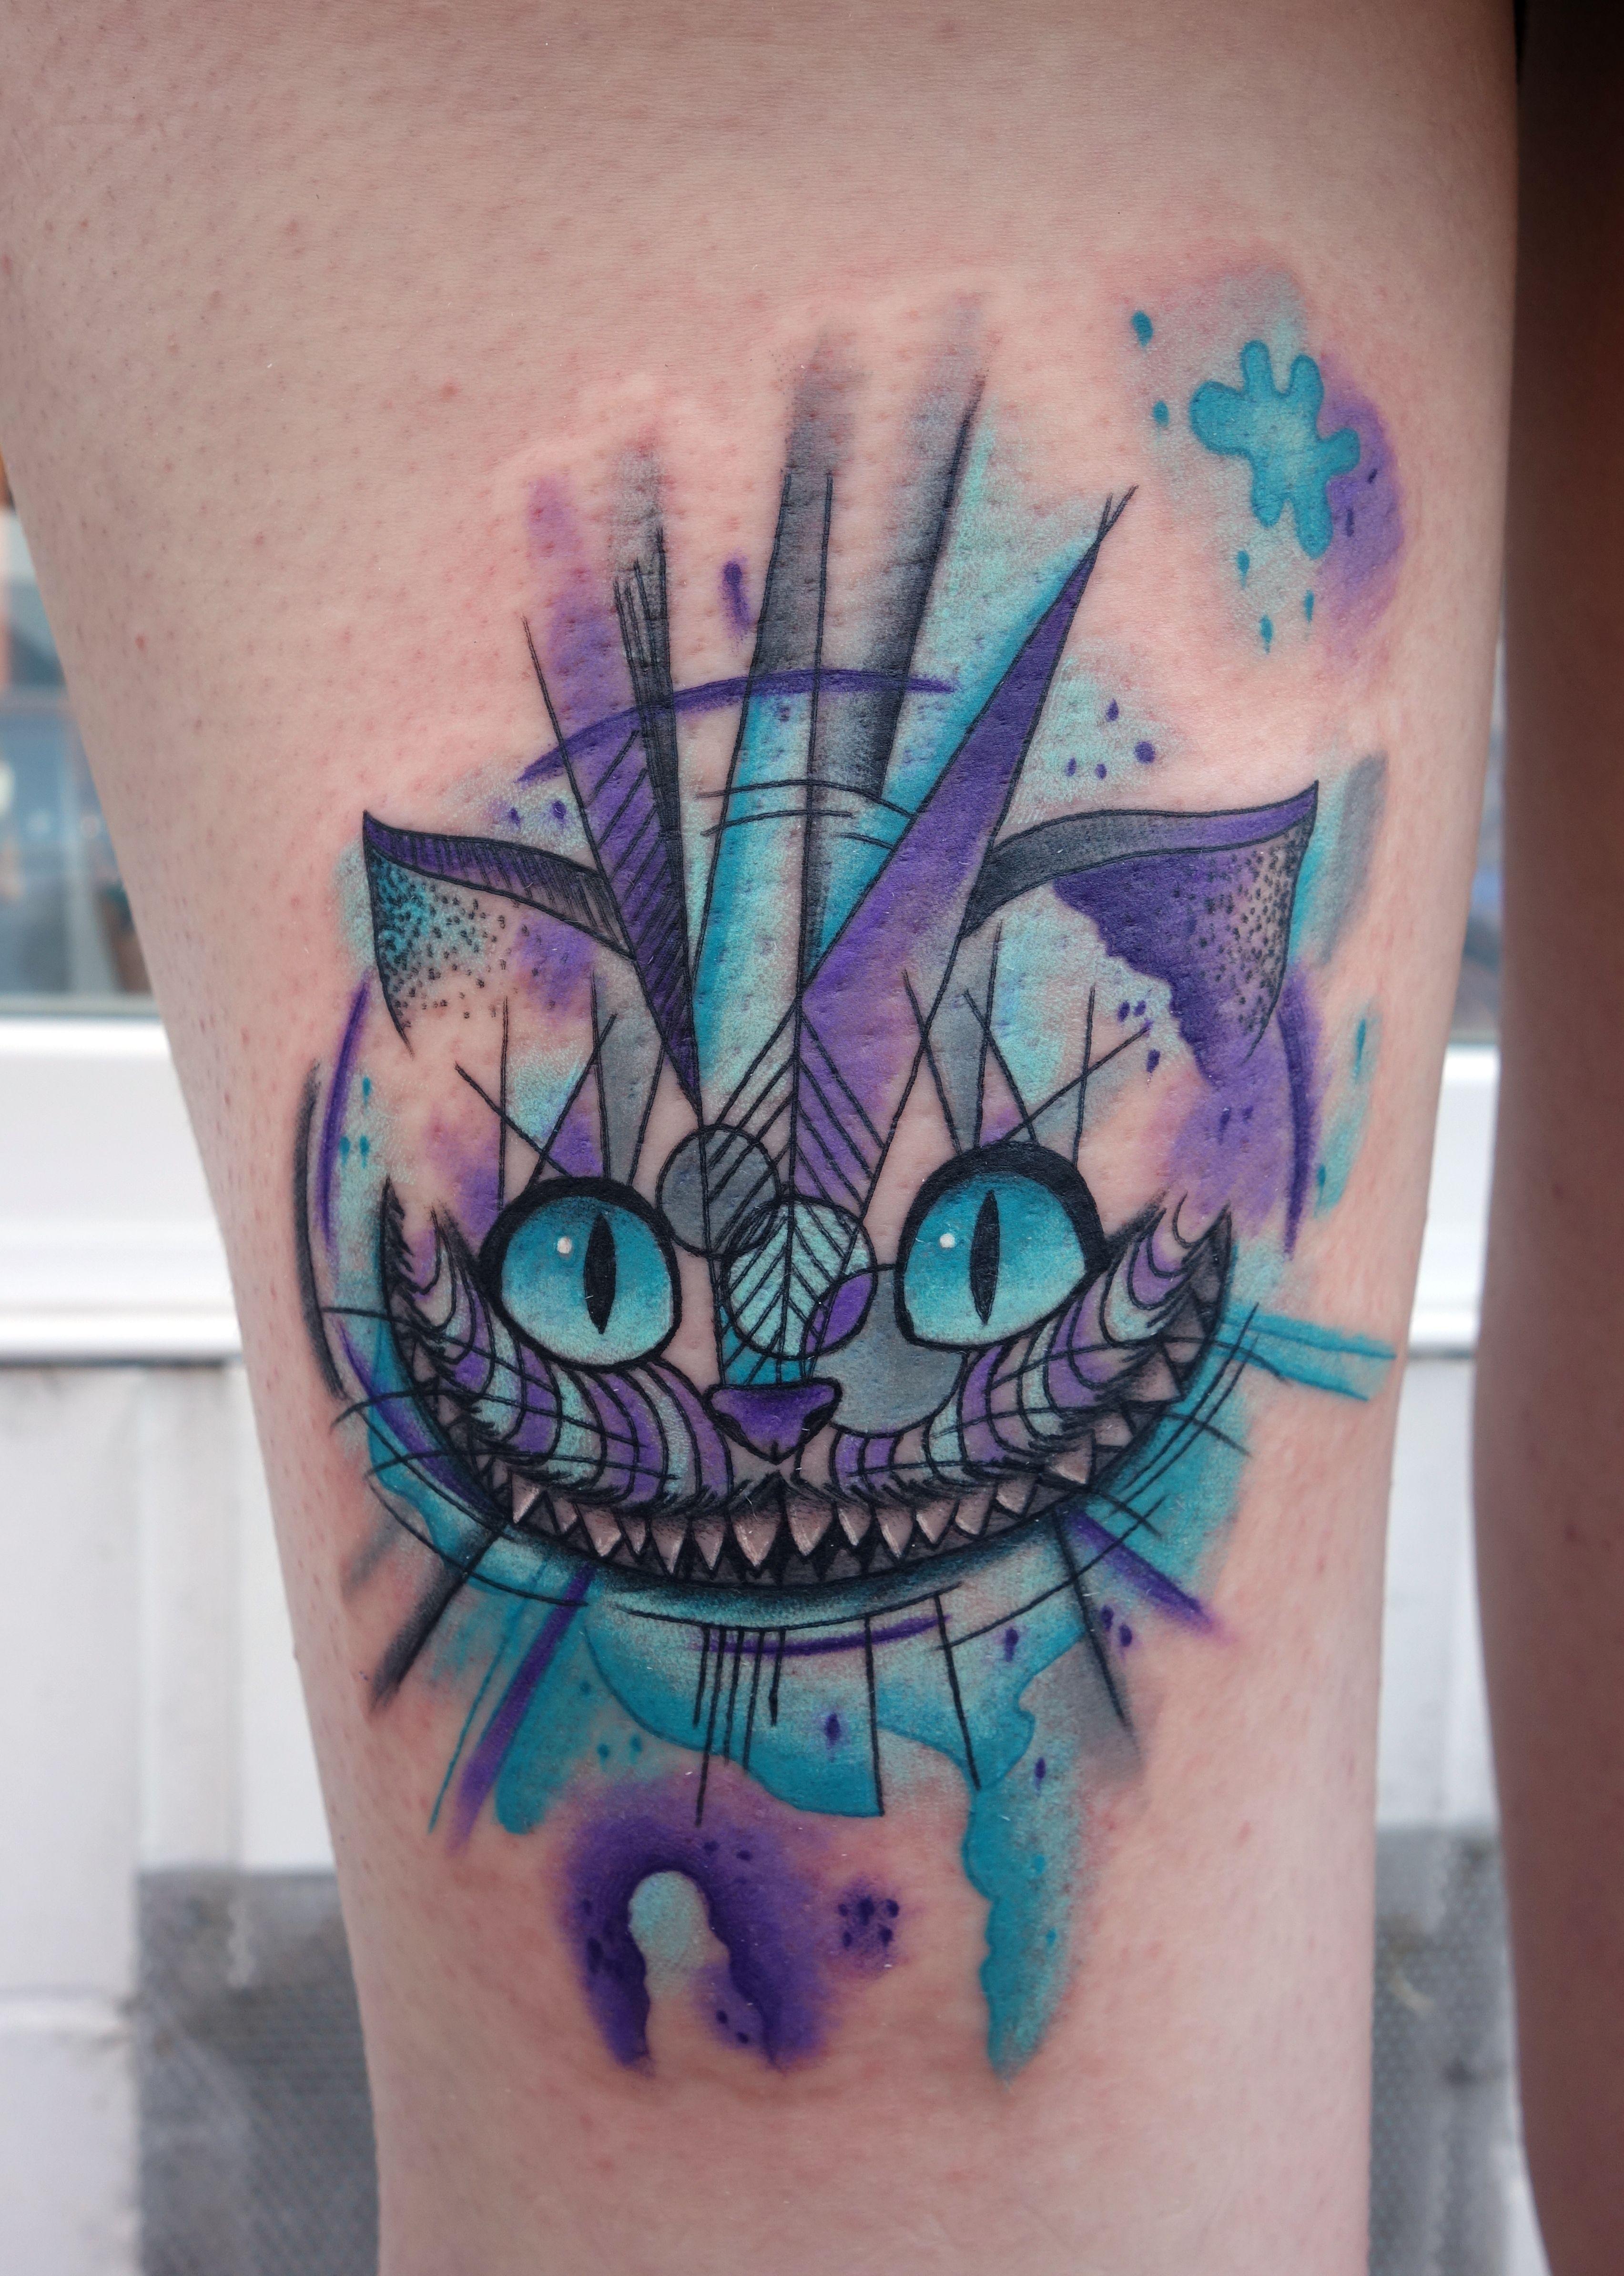 abstrakte grinsekatze cheshirecat tattoo tattoo oberschenkel aquarell tattoo watercolor. Black Bedroom Furniture Sets. Home Design Ideas